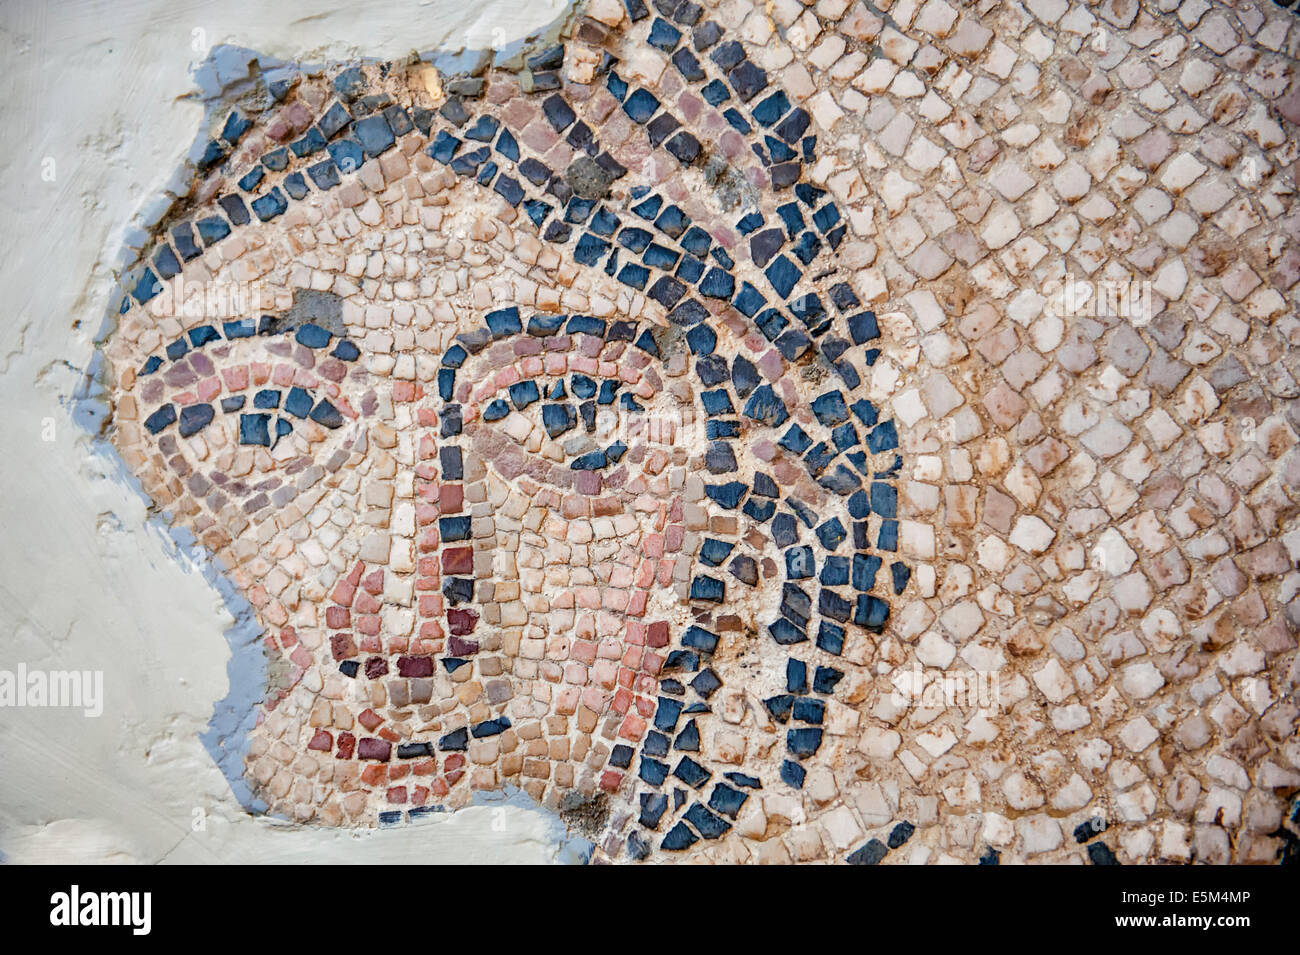 Ananeosis (Erwachen) Mosaik, 5. Cent A.C., Hatay Archäologie Museum, Antiochia, Hatay Provinz, Südwestküste Türkei Stockfoto